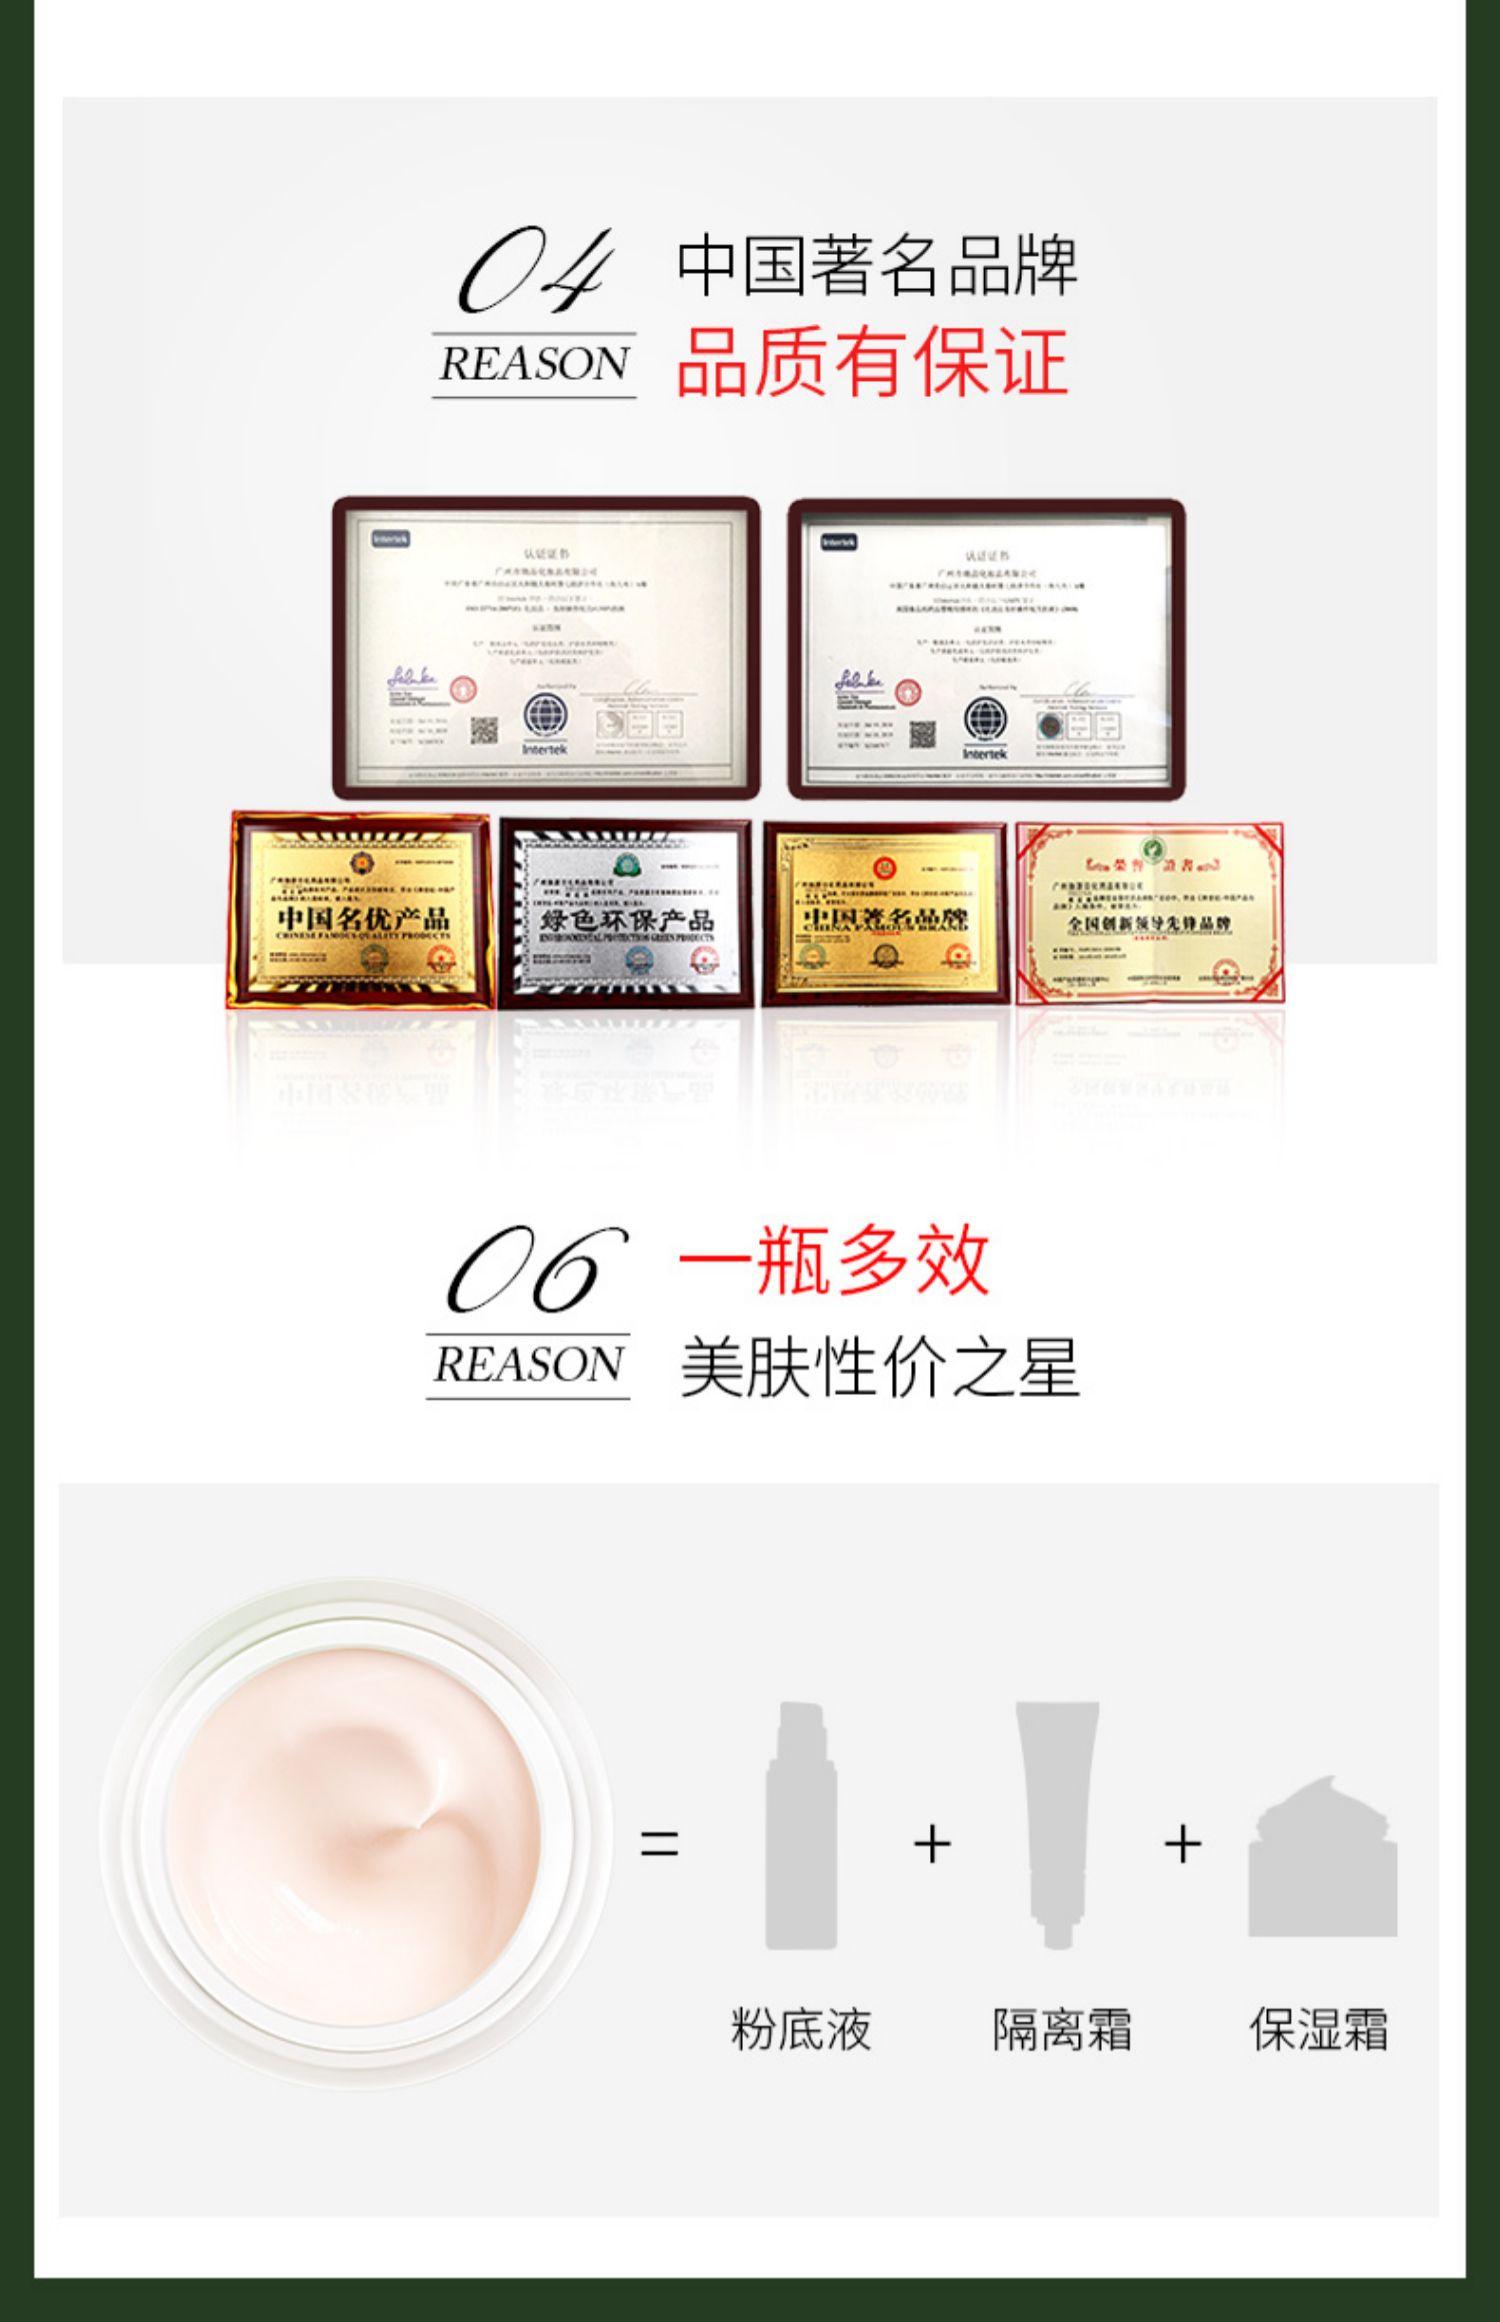 DELENA蝶莲娜贵妇膏 素颜美提亮肤色温和修护珍珠盒鲜萃神仙膏商品详情图